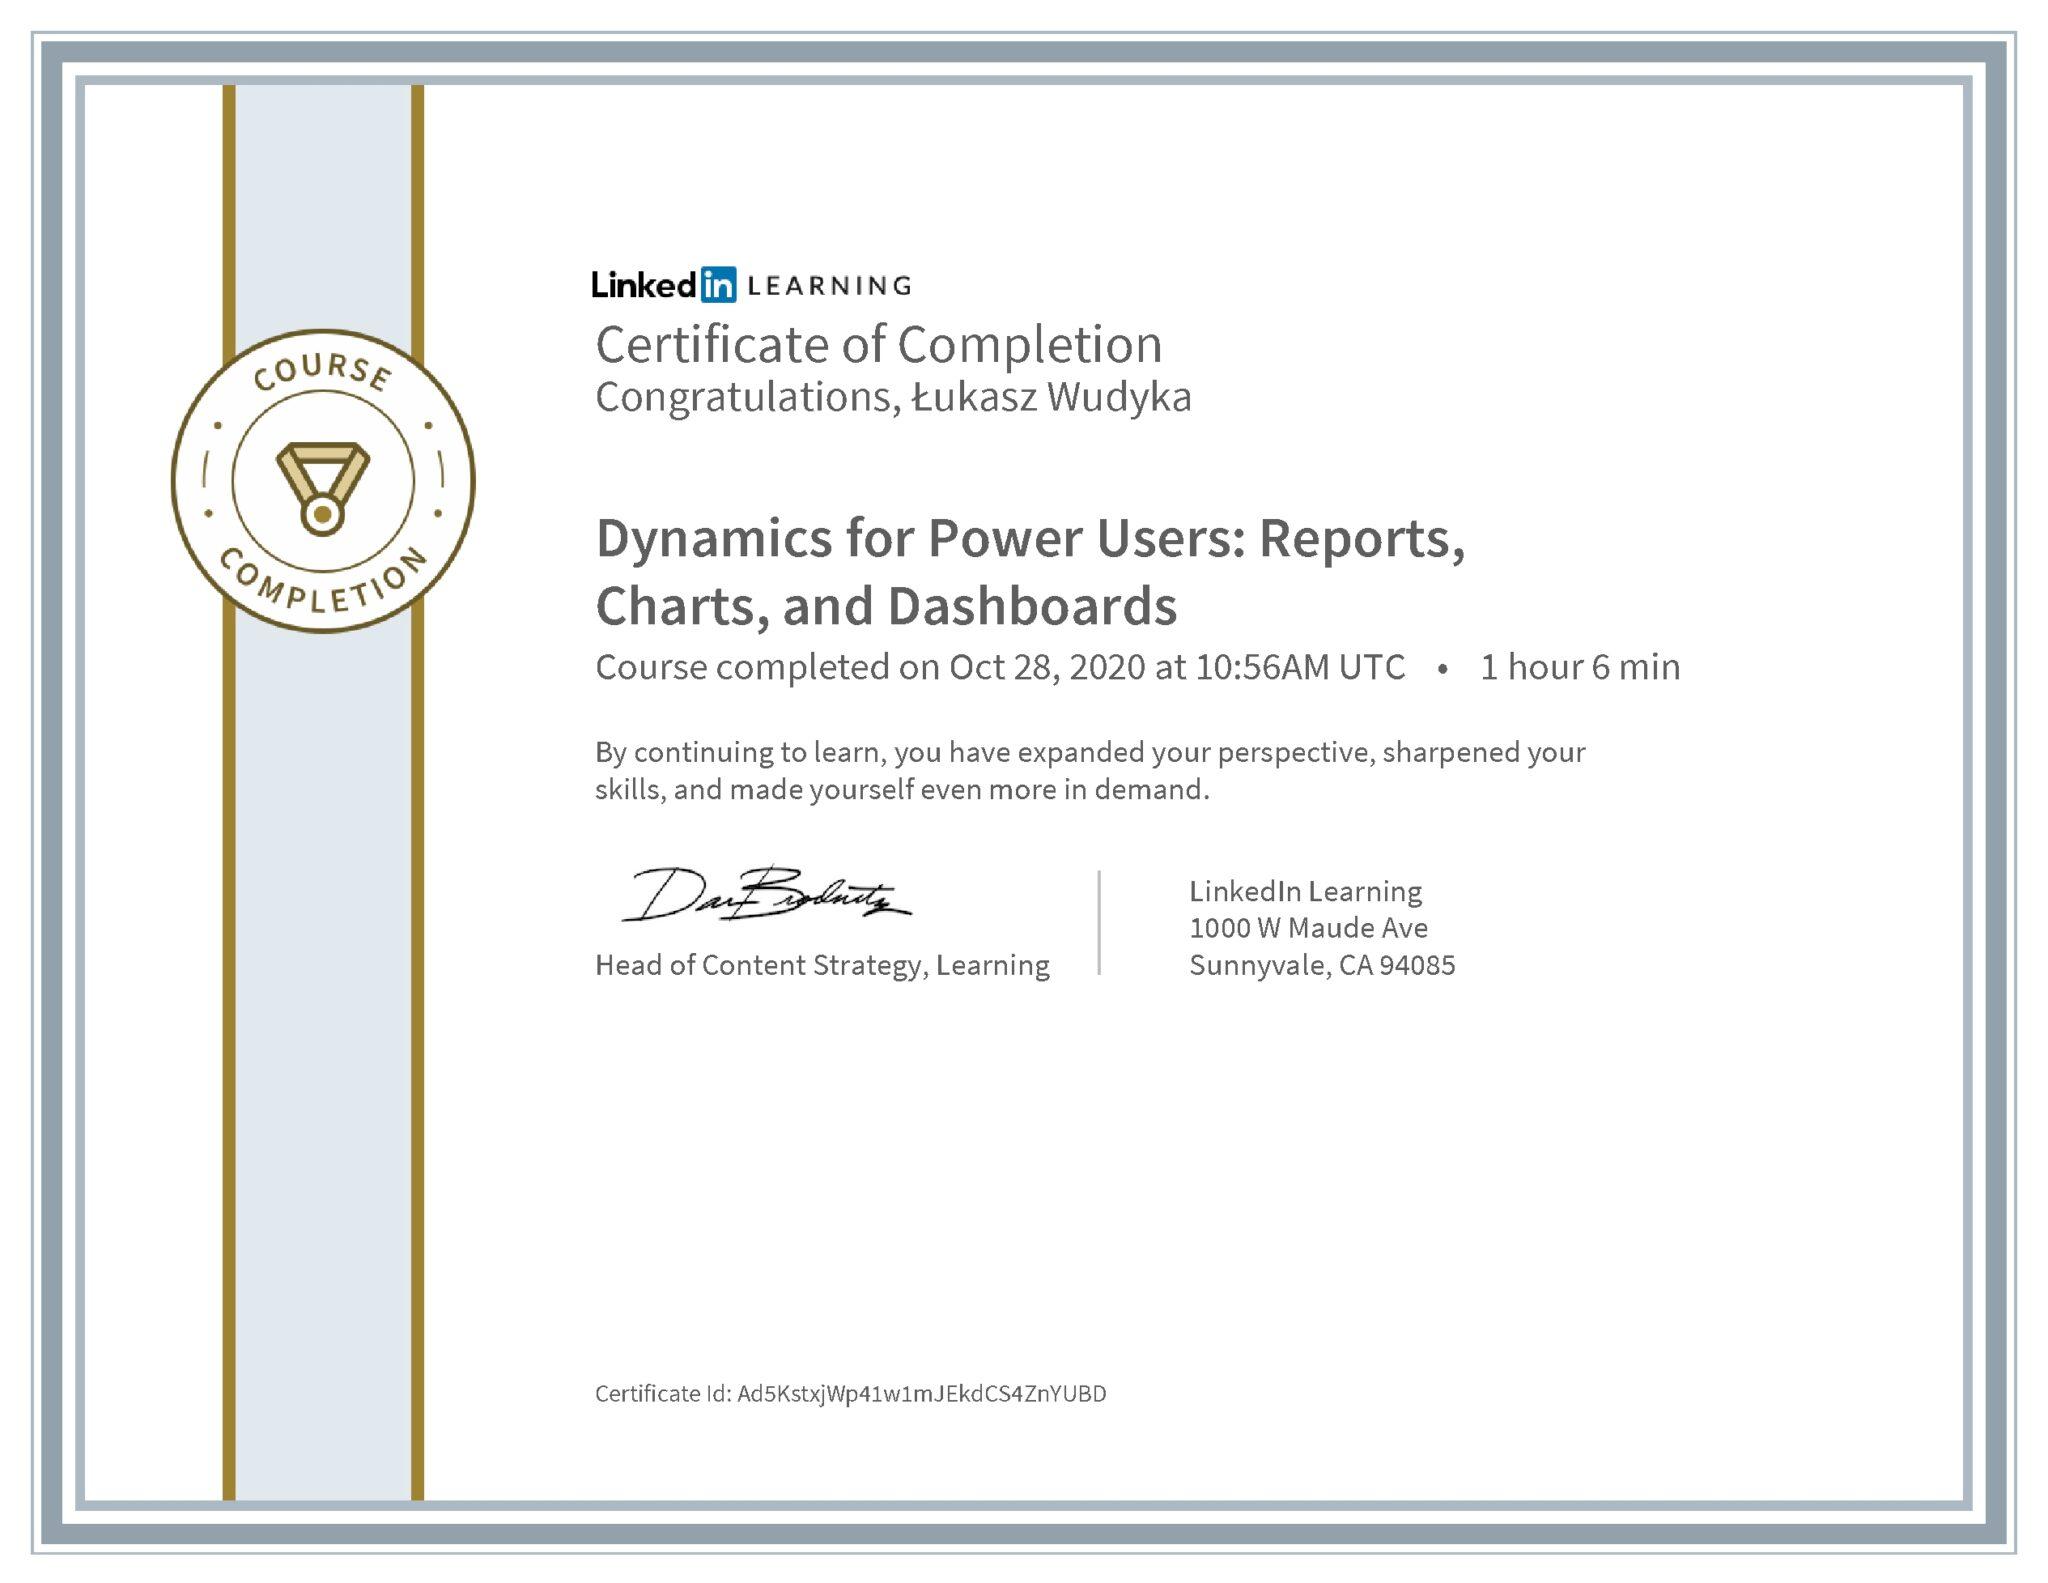 Łukasz Wudyka certyfikat LinkedIn Dynamics for Power Users: Reports, Charts, and Dashboards